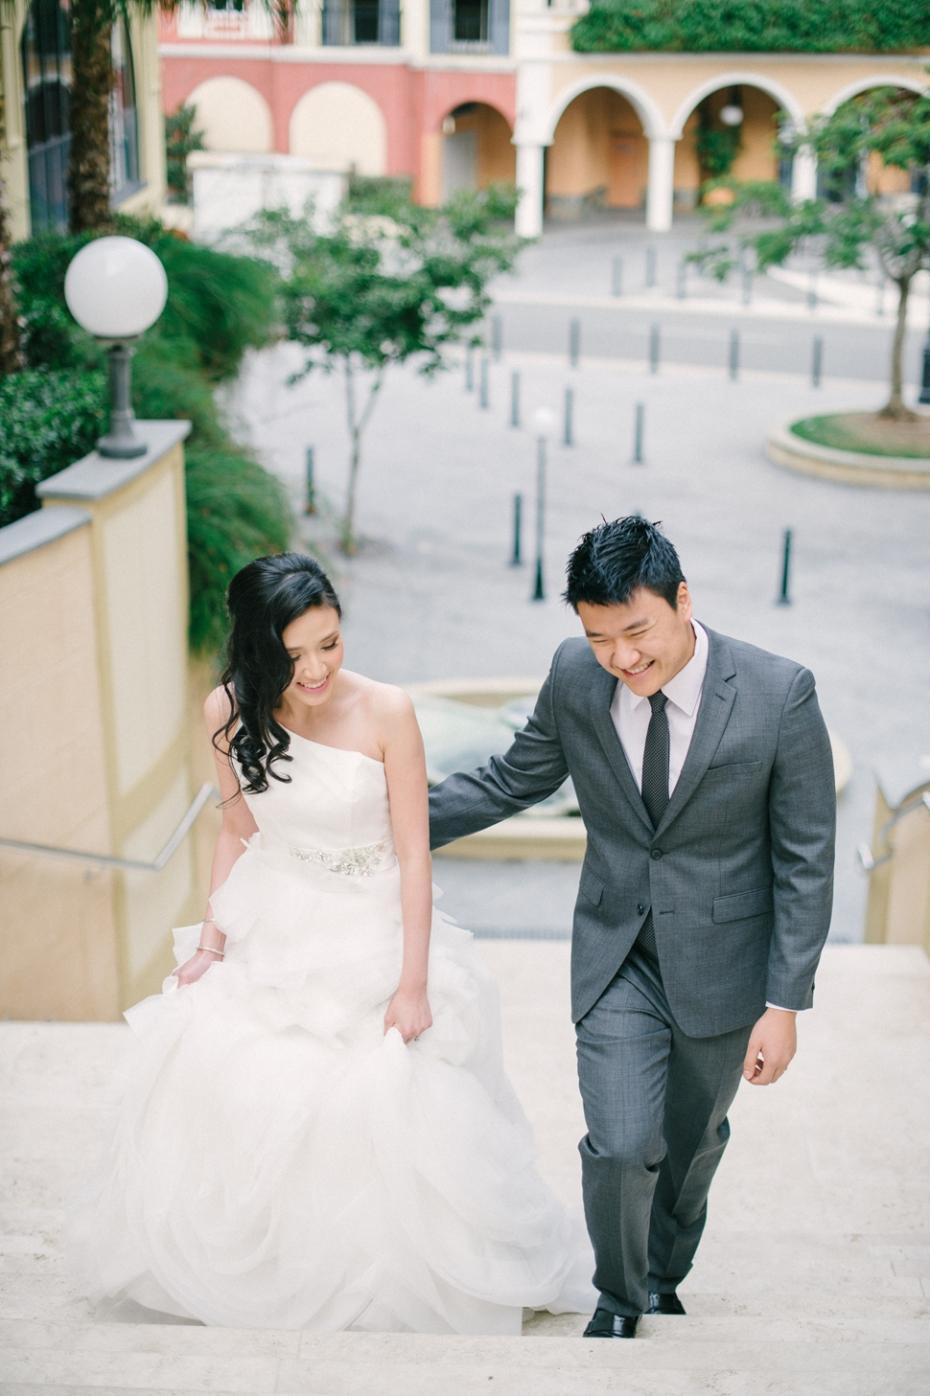 uyen-ron-wedding-emerald-lakes-gold-coast-photographer001